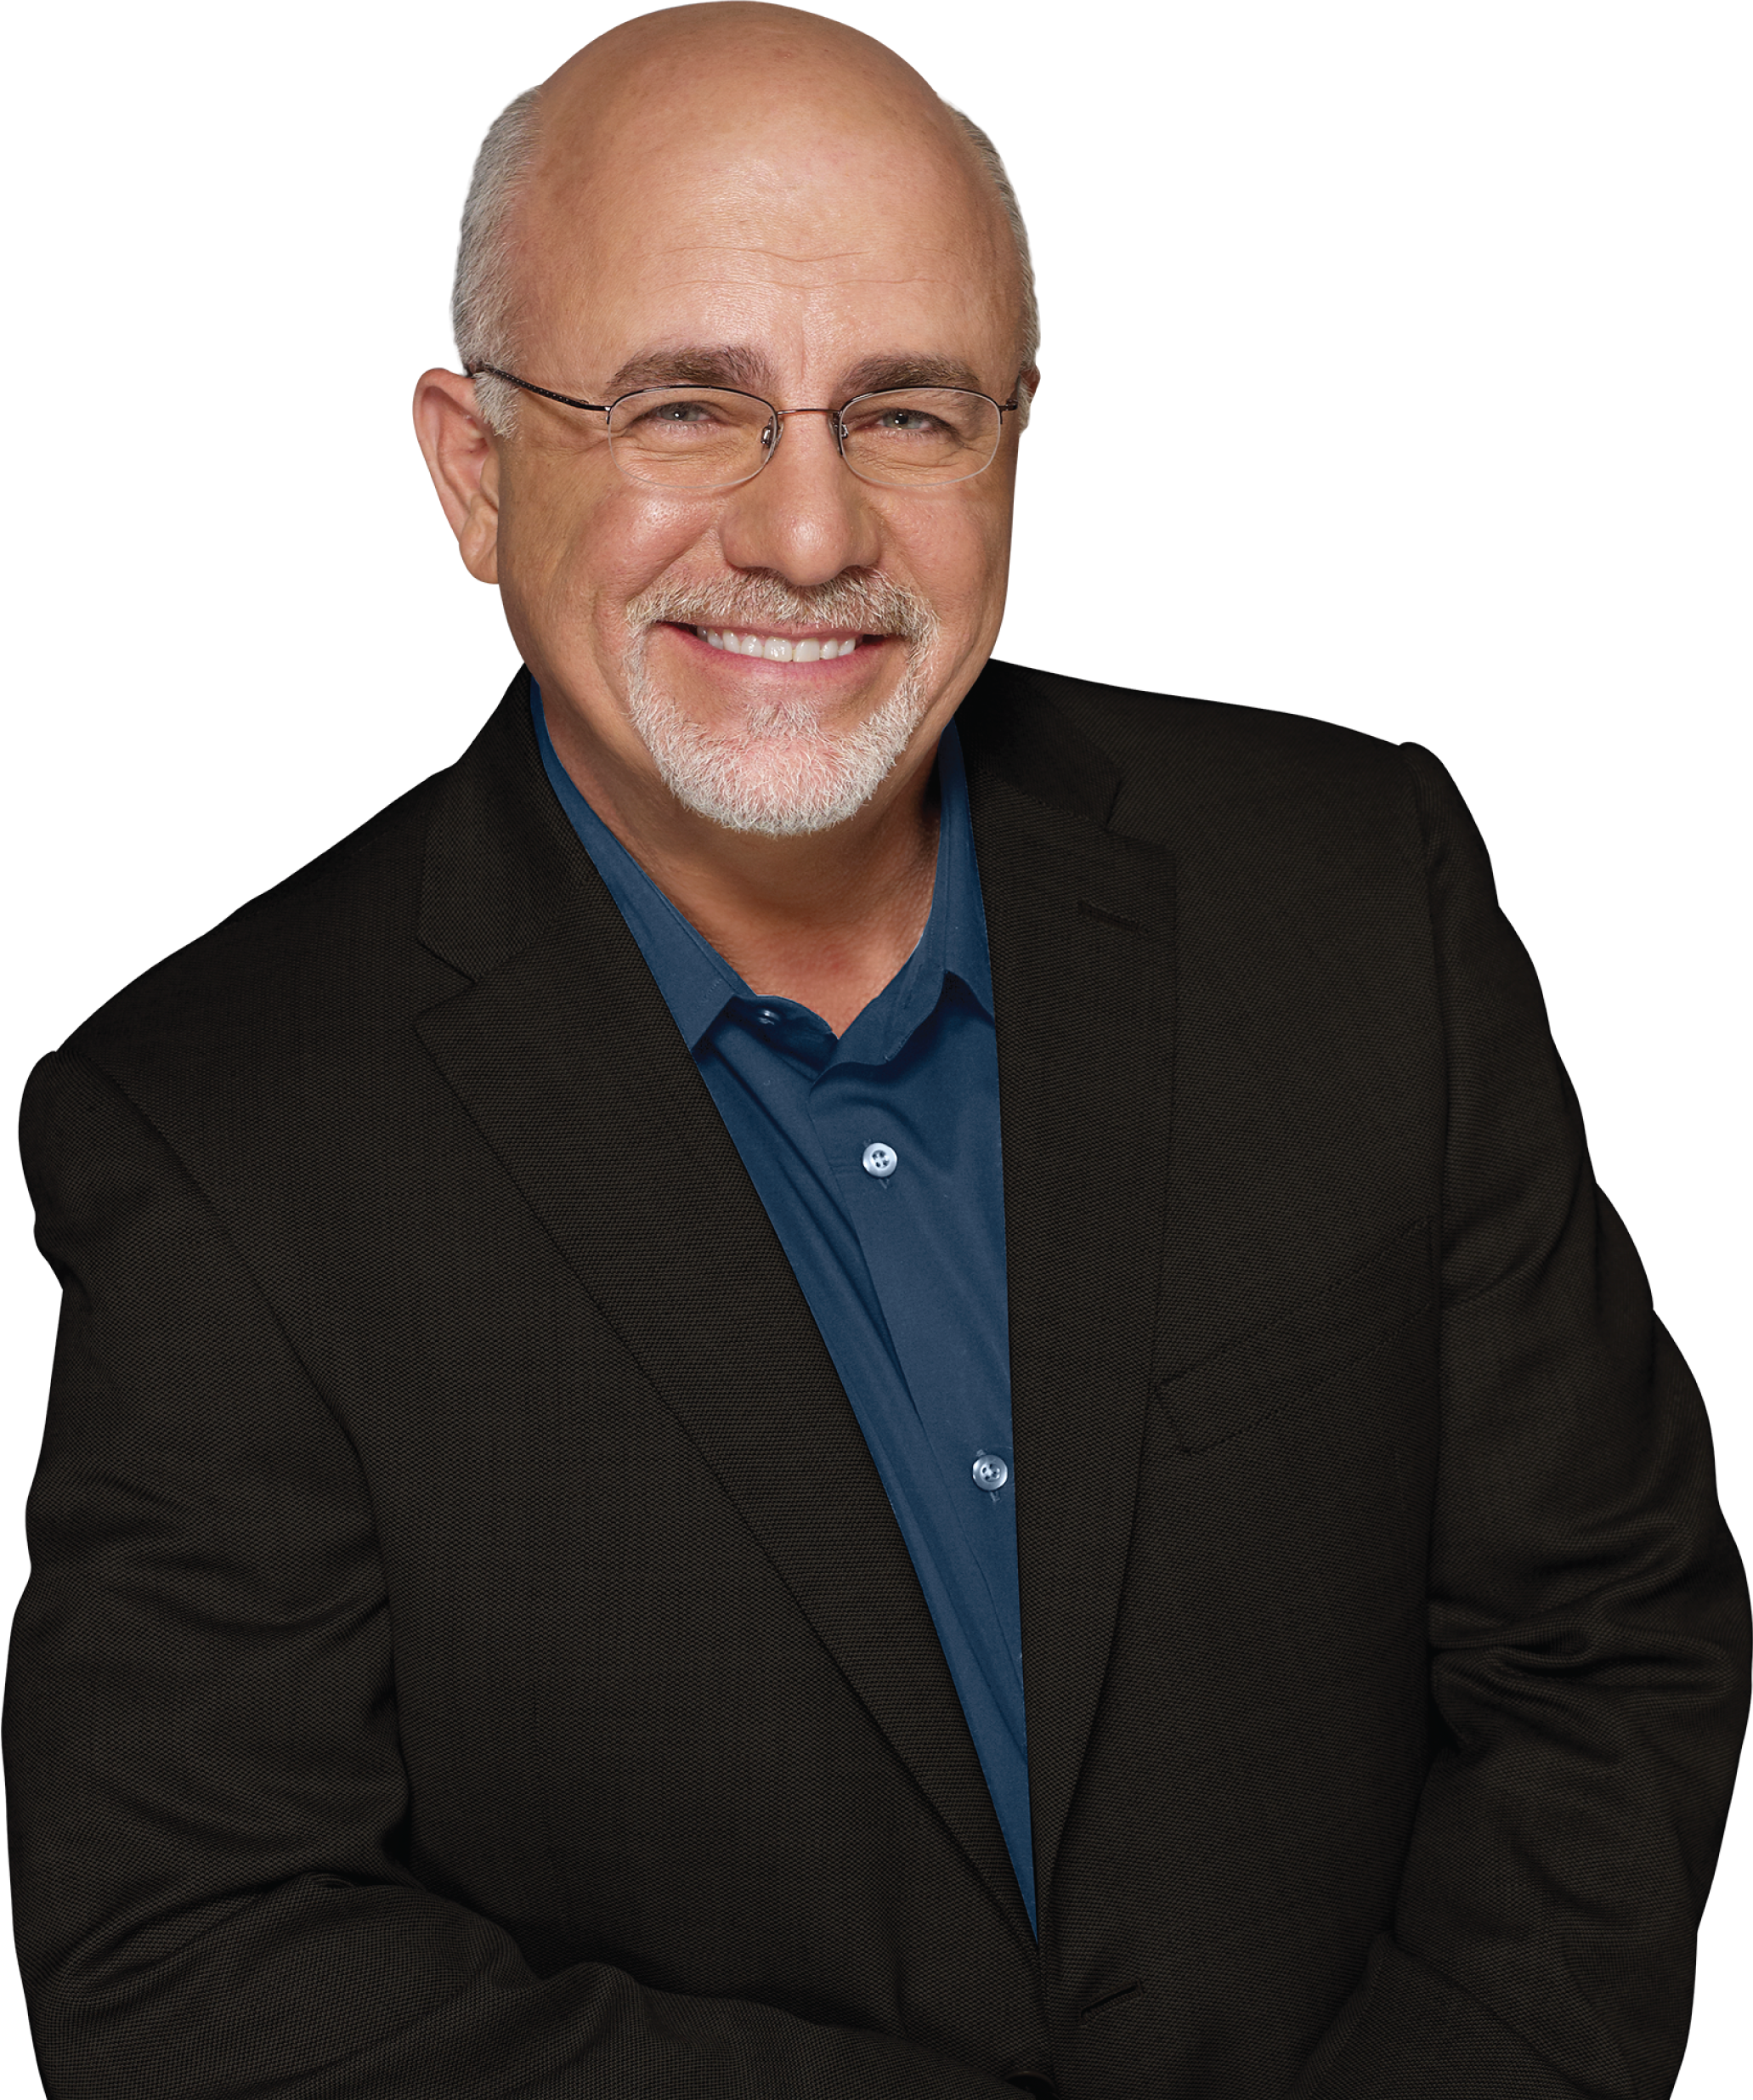 Dave Ramsey Lafayette, LA The Rock Financial Group